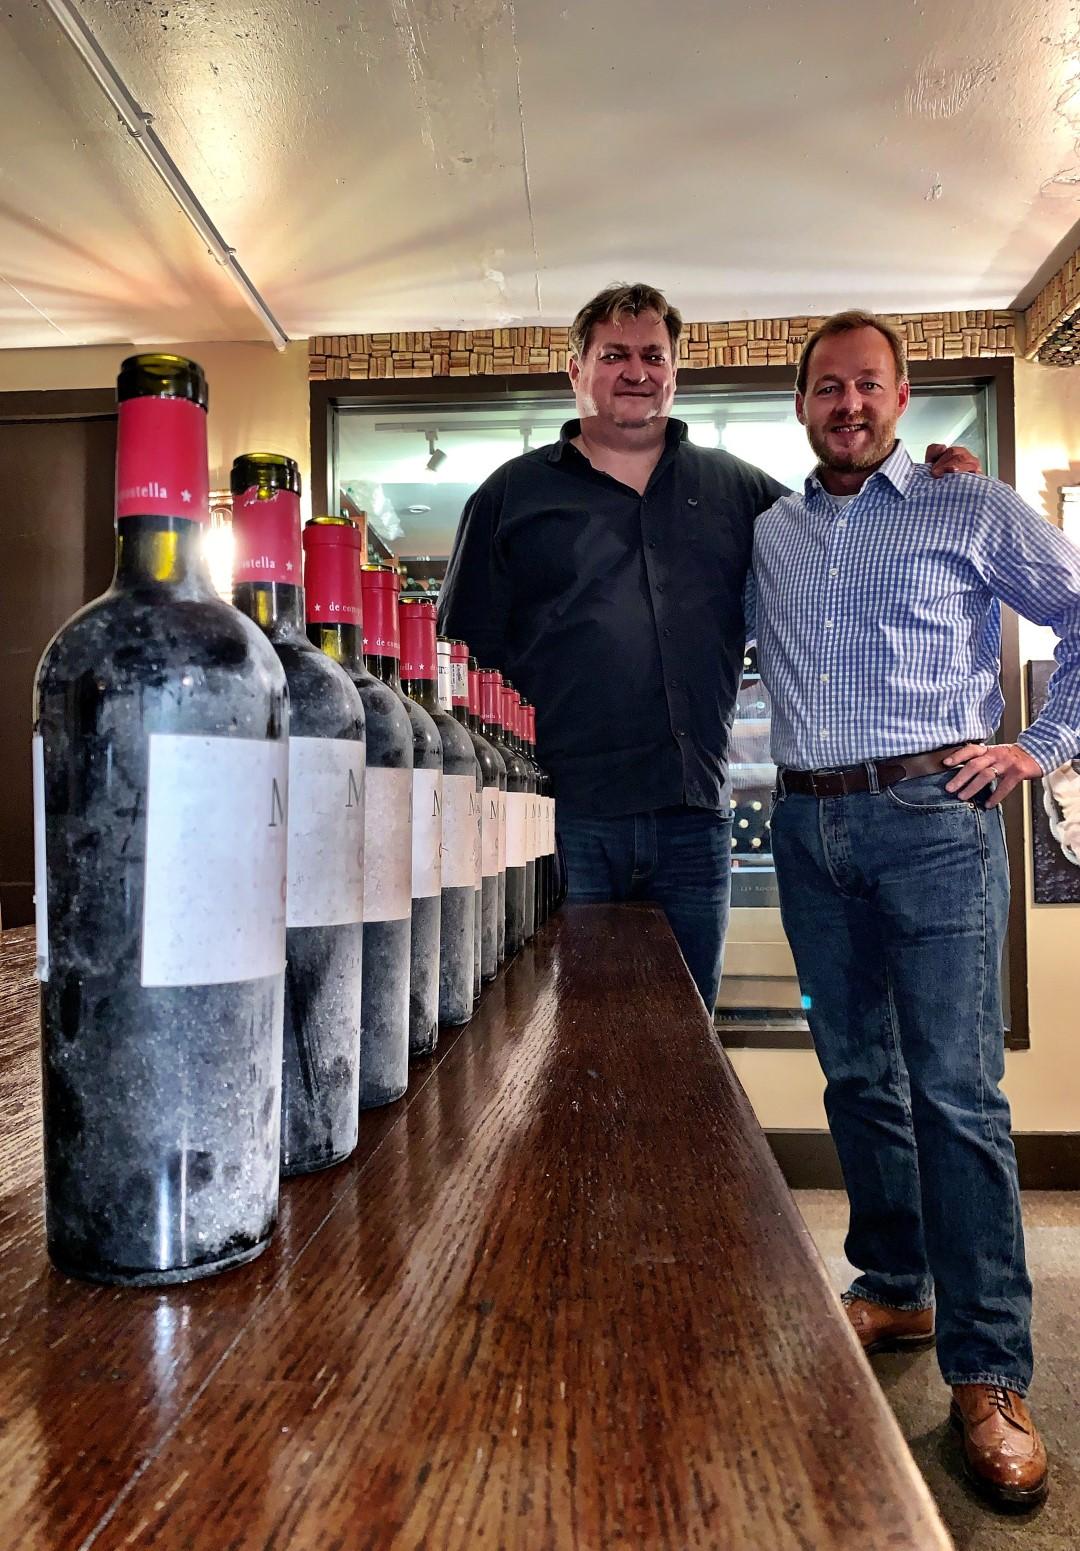 Greg Sherwood Mw: Amidst Profound Change, Sa Fine Wine Finds Favour photo